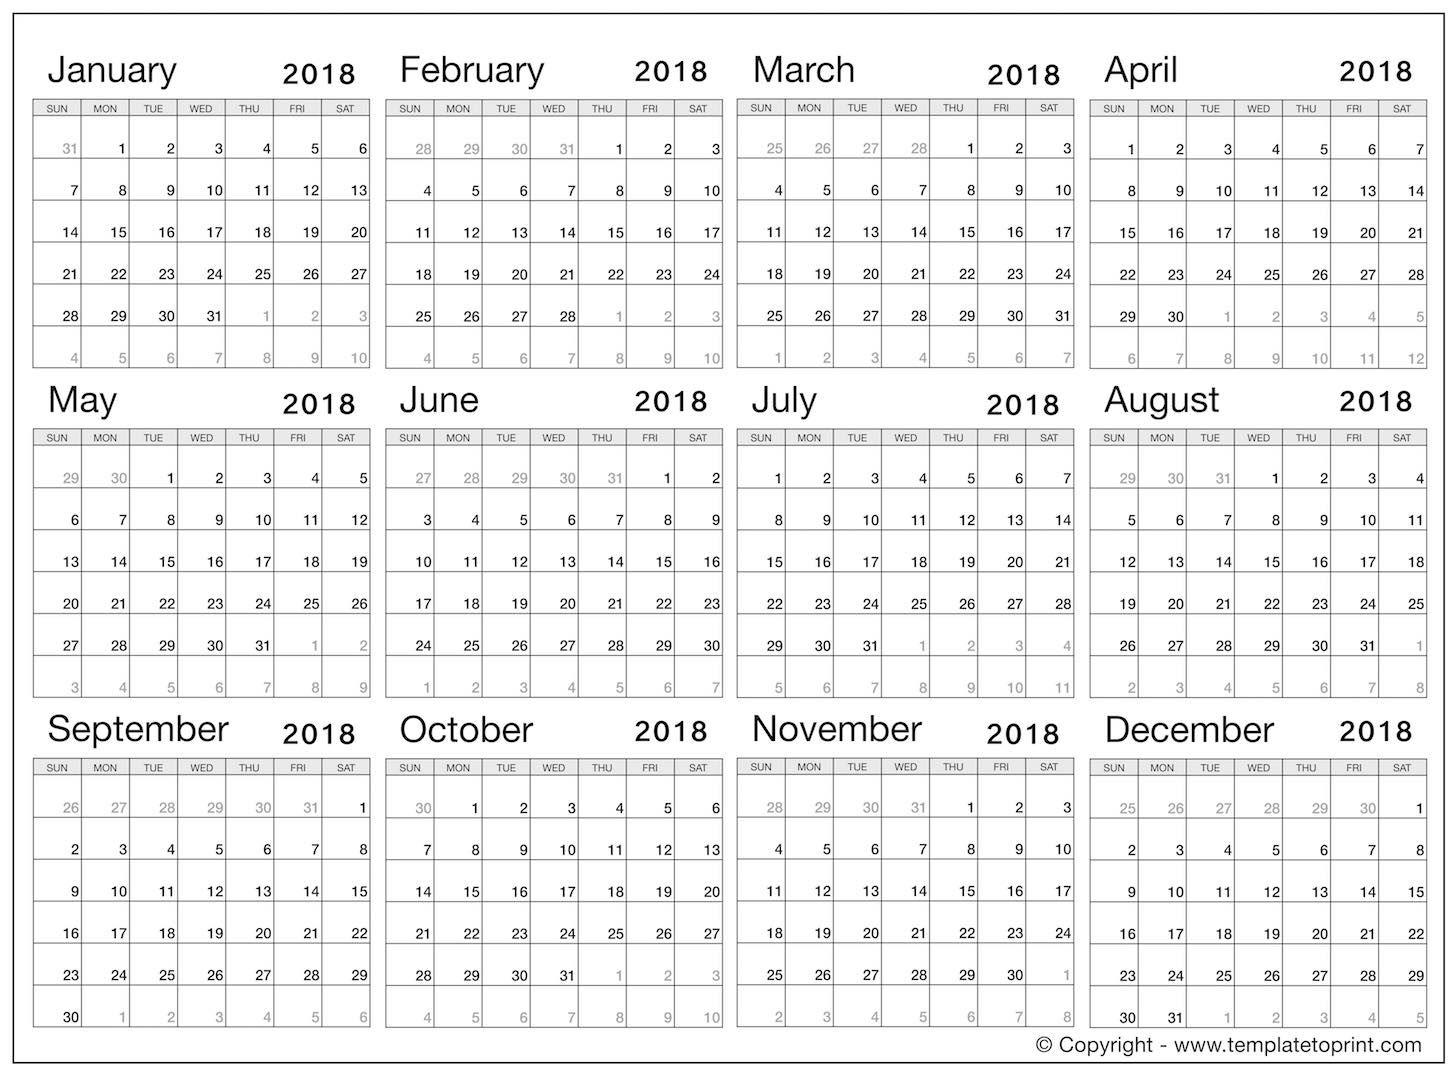 Free Calendar 2018 Printable Pdf | January February March April